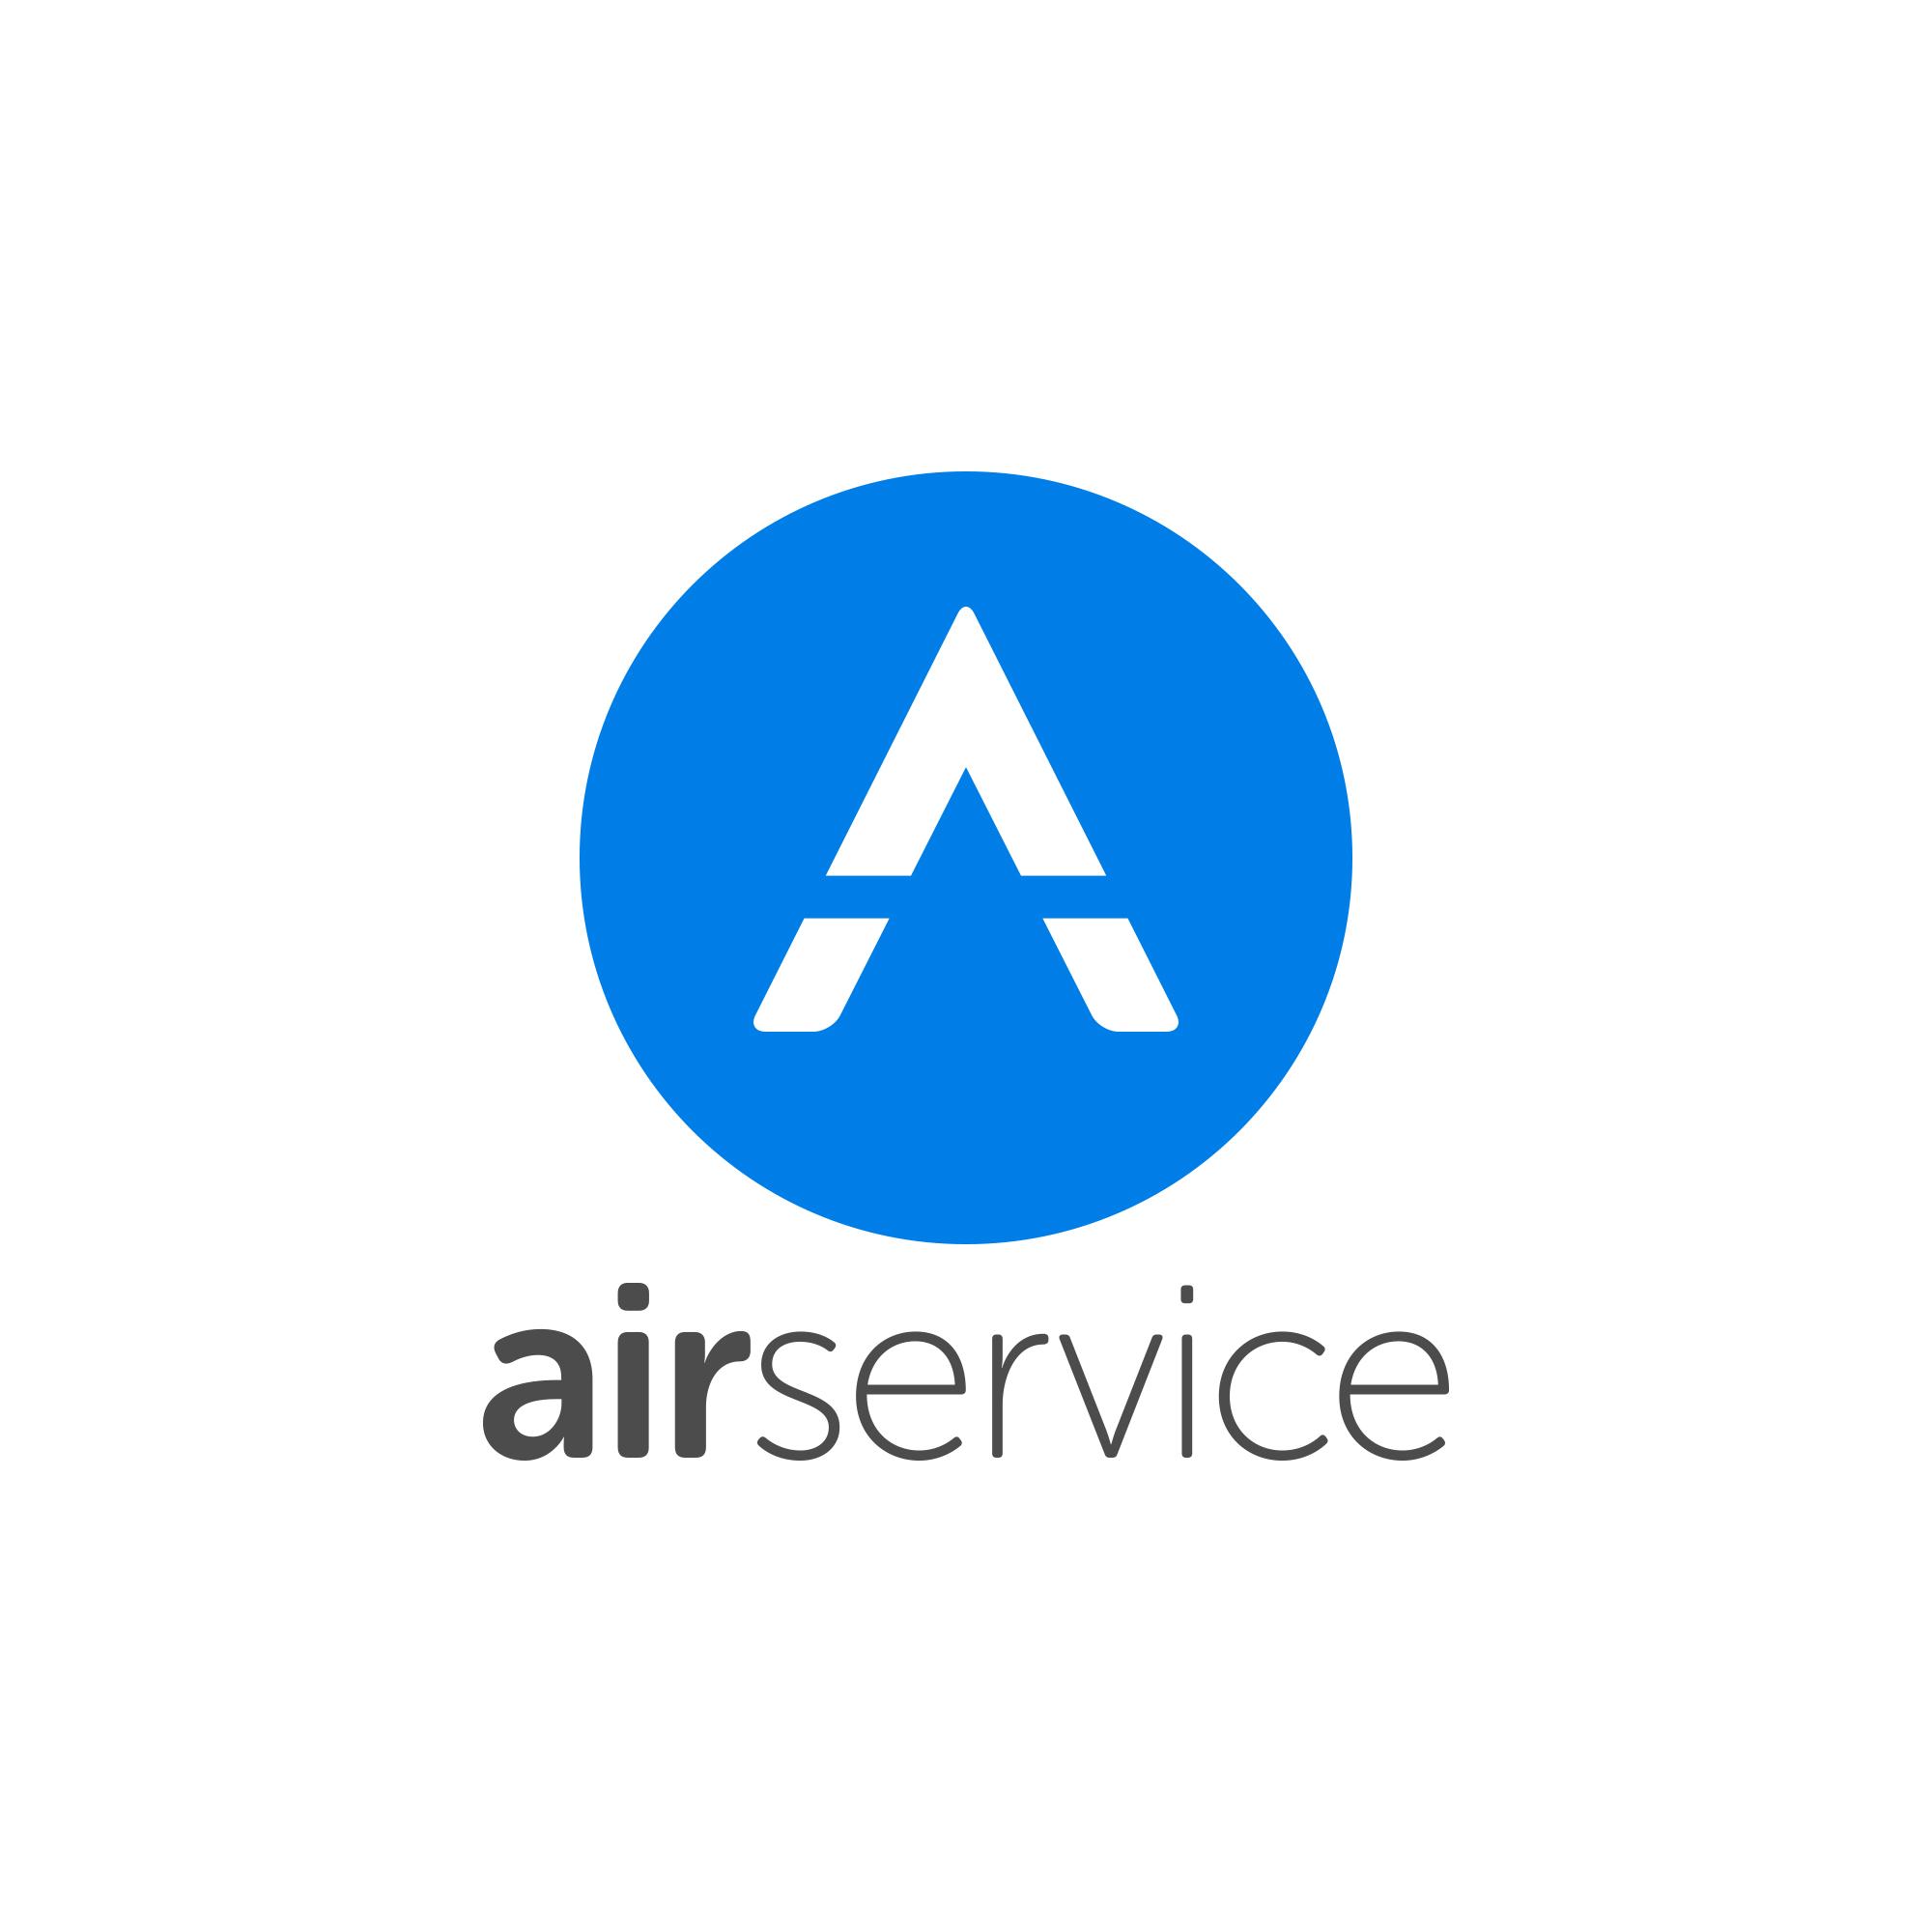 airservice-logo.jpg